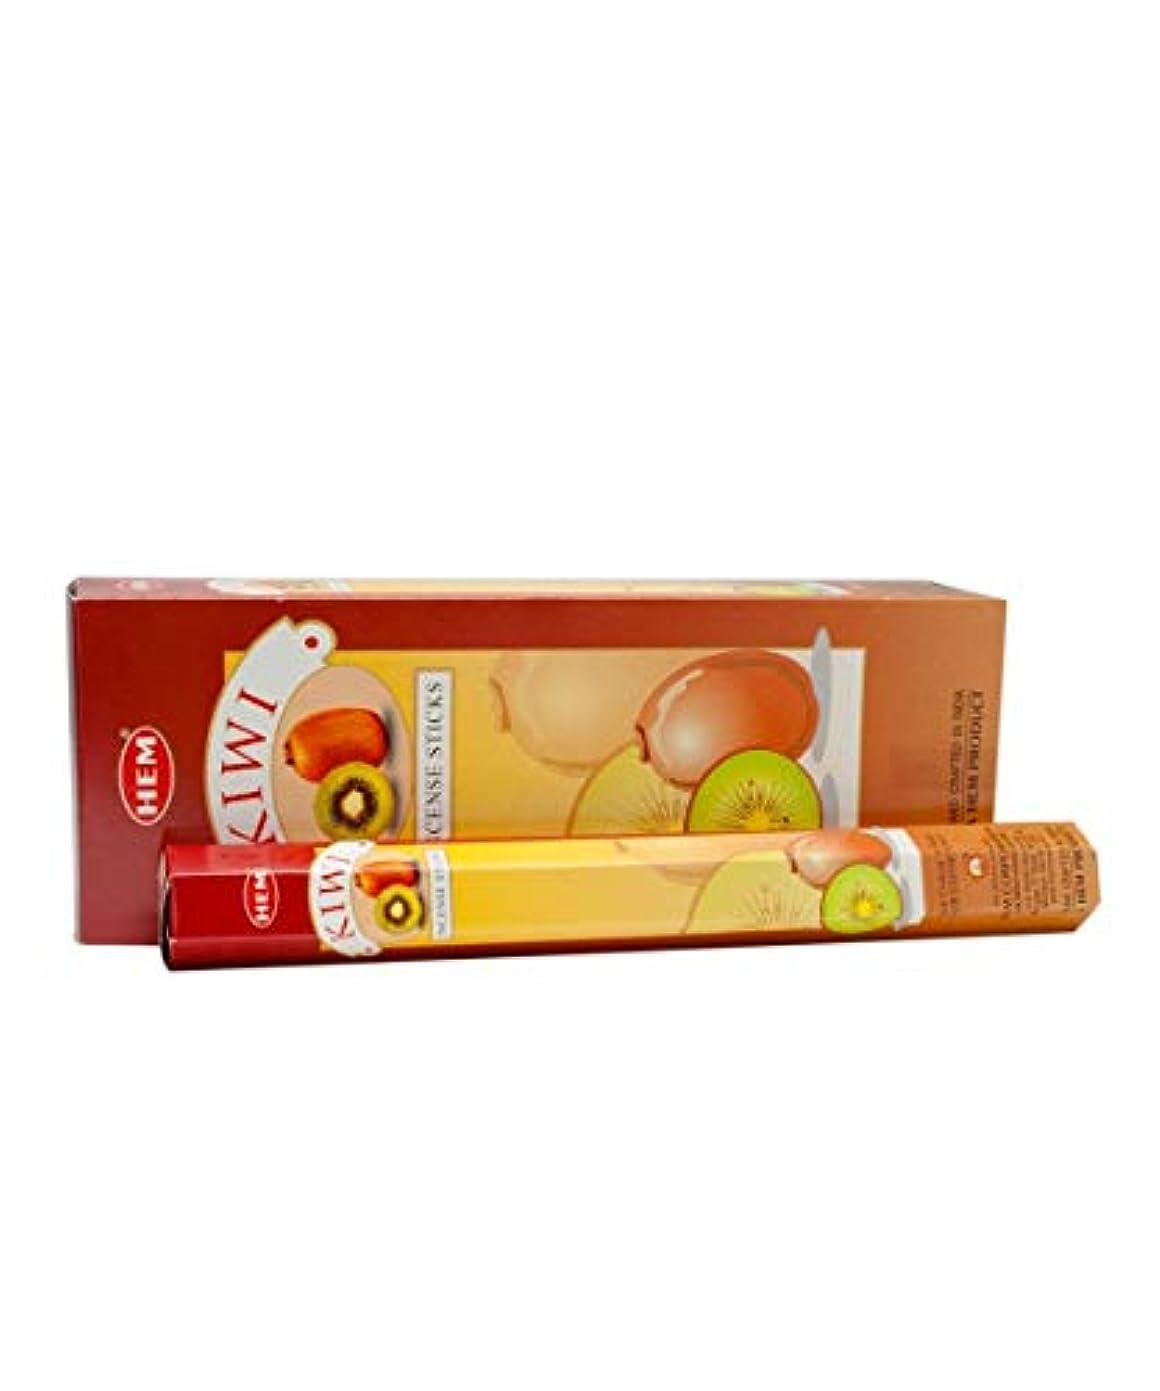 溝休憩する基礎理論Hem Kiwi Incense Sticks (9.3 cm X 6.0 cm X 25.5cm, Black)